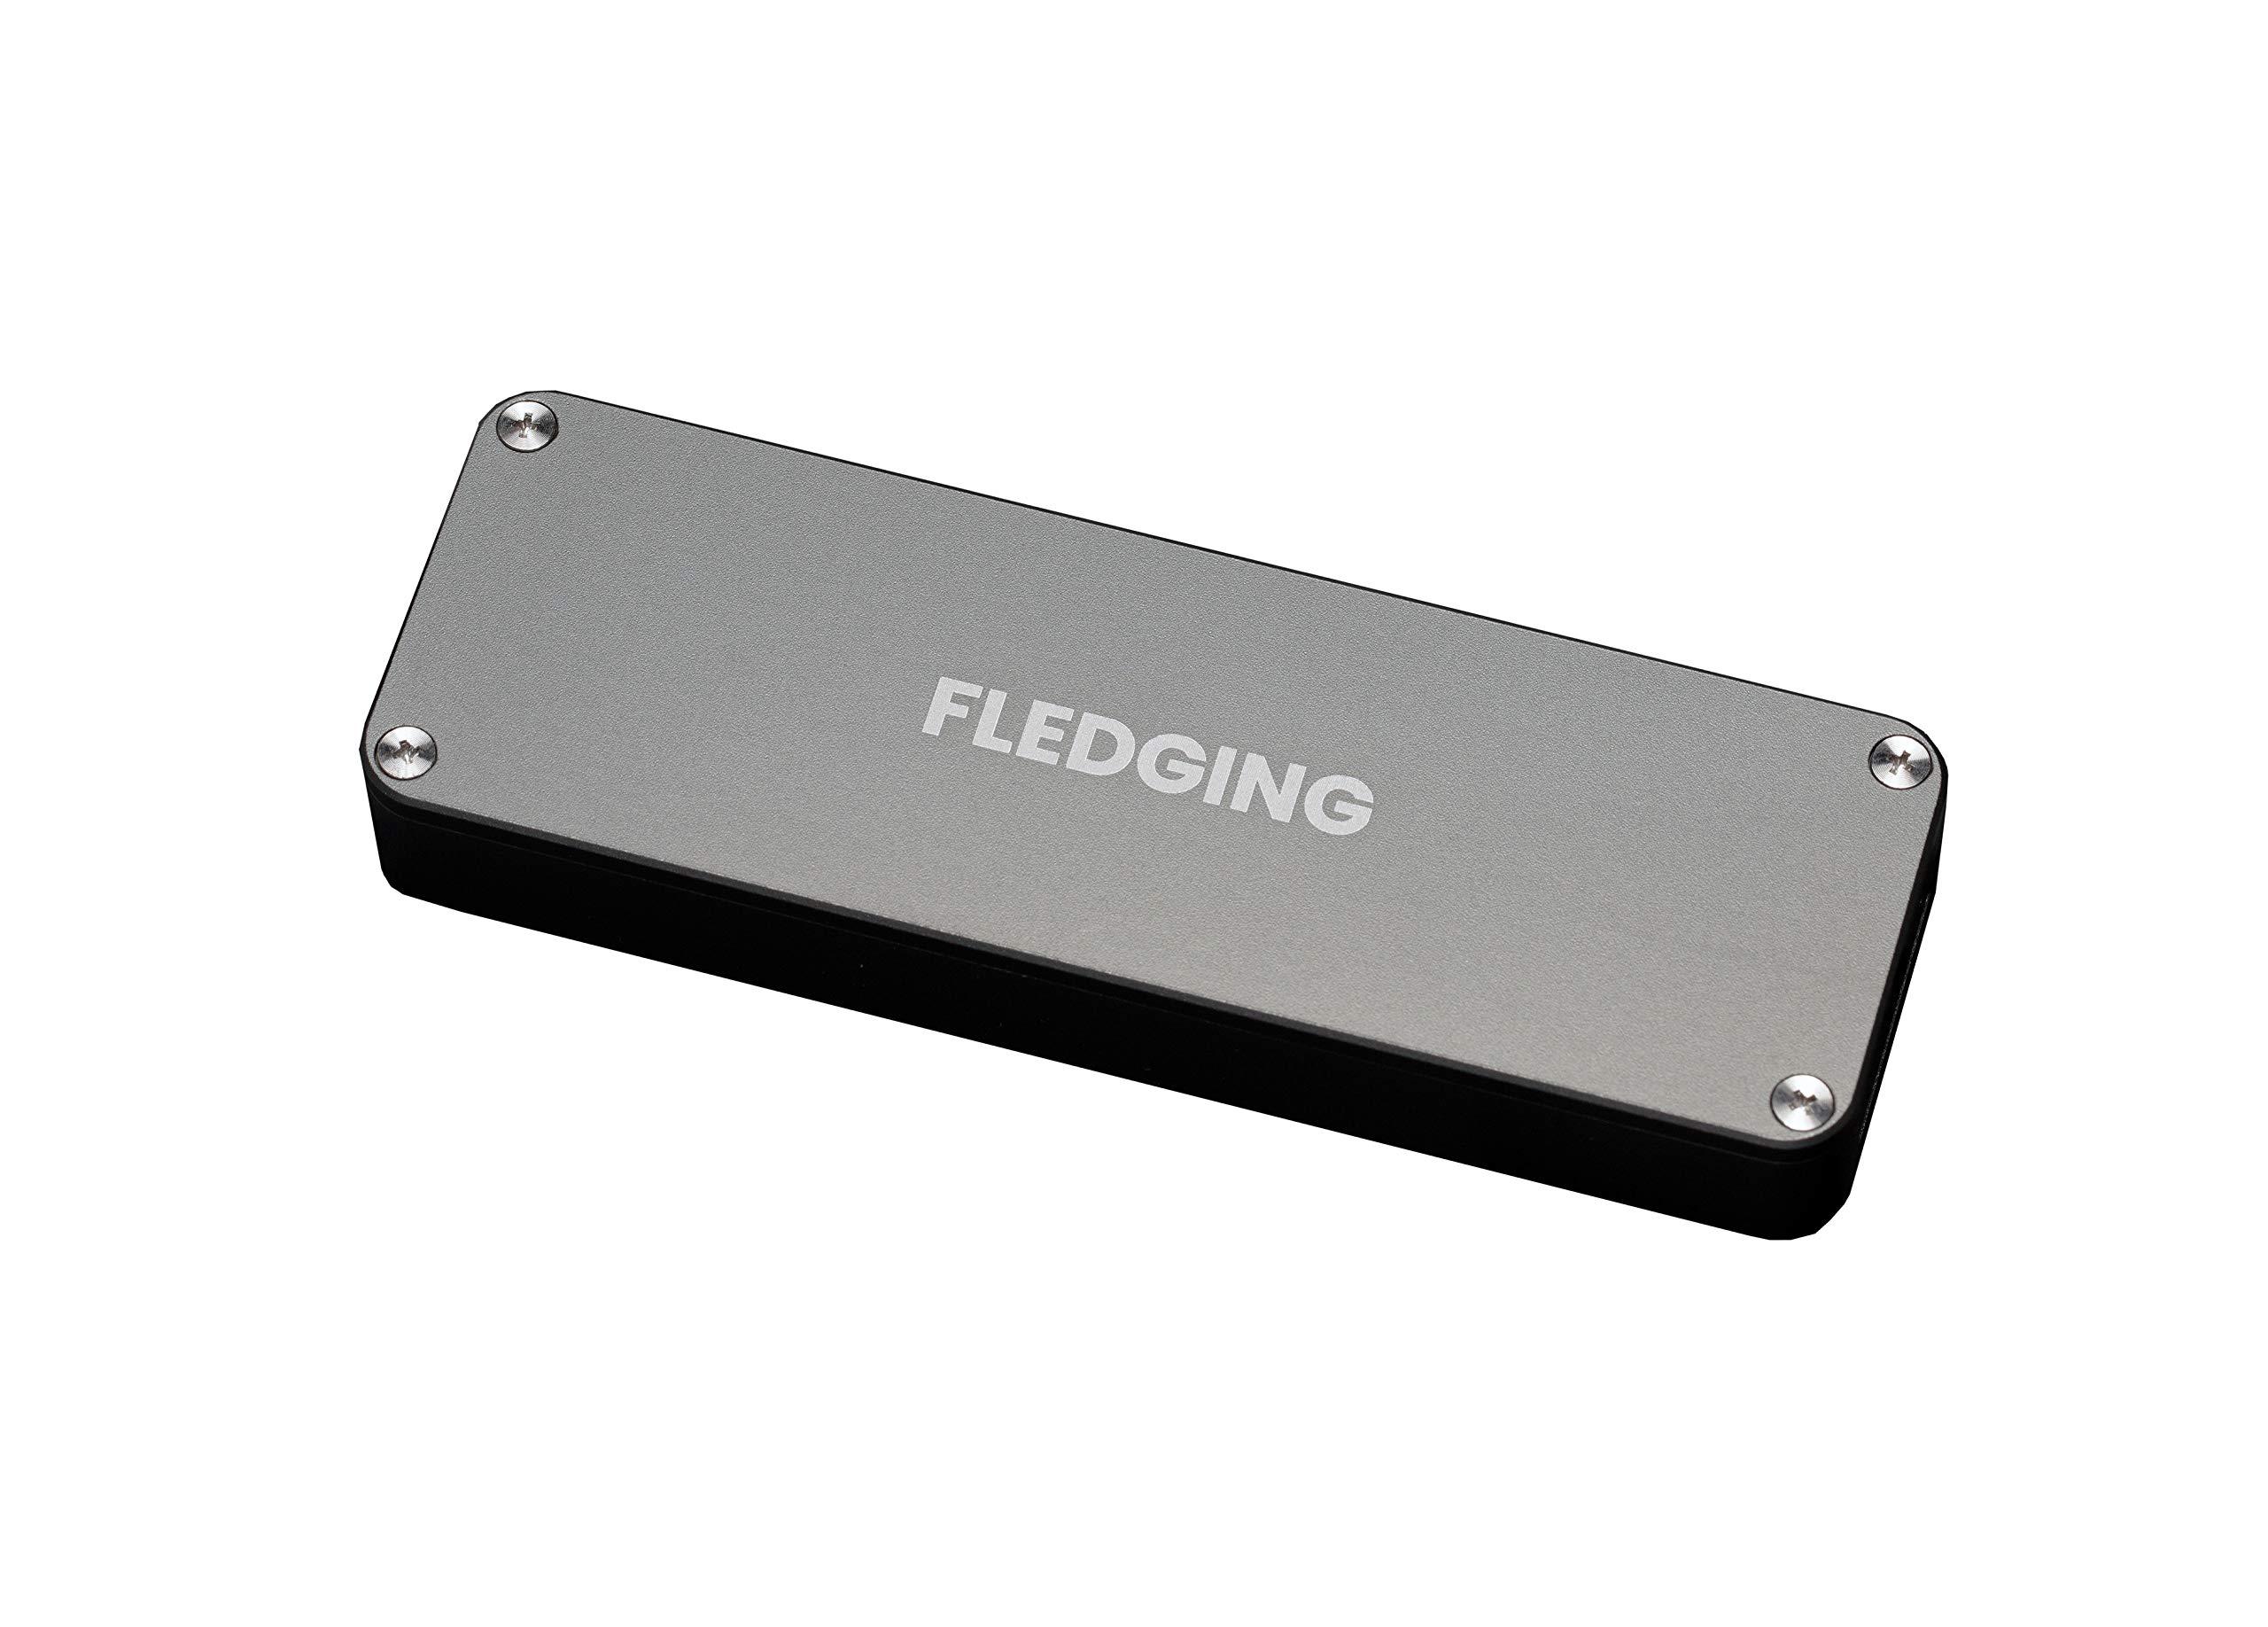 Shell SSD External Hard Drive Enclosure (0GB, Enclosure Only) - PCIe USB 3.1 Portable External SSD Enclosure m.2 to USB 3.1, Fan Cooled